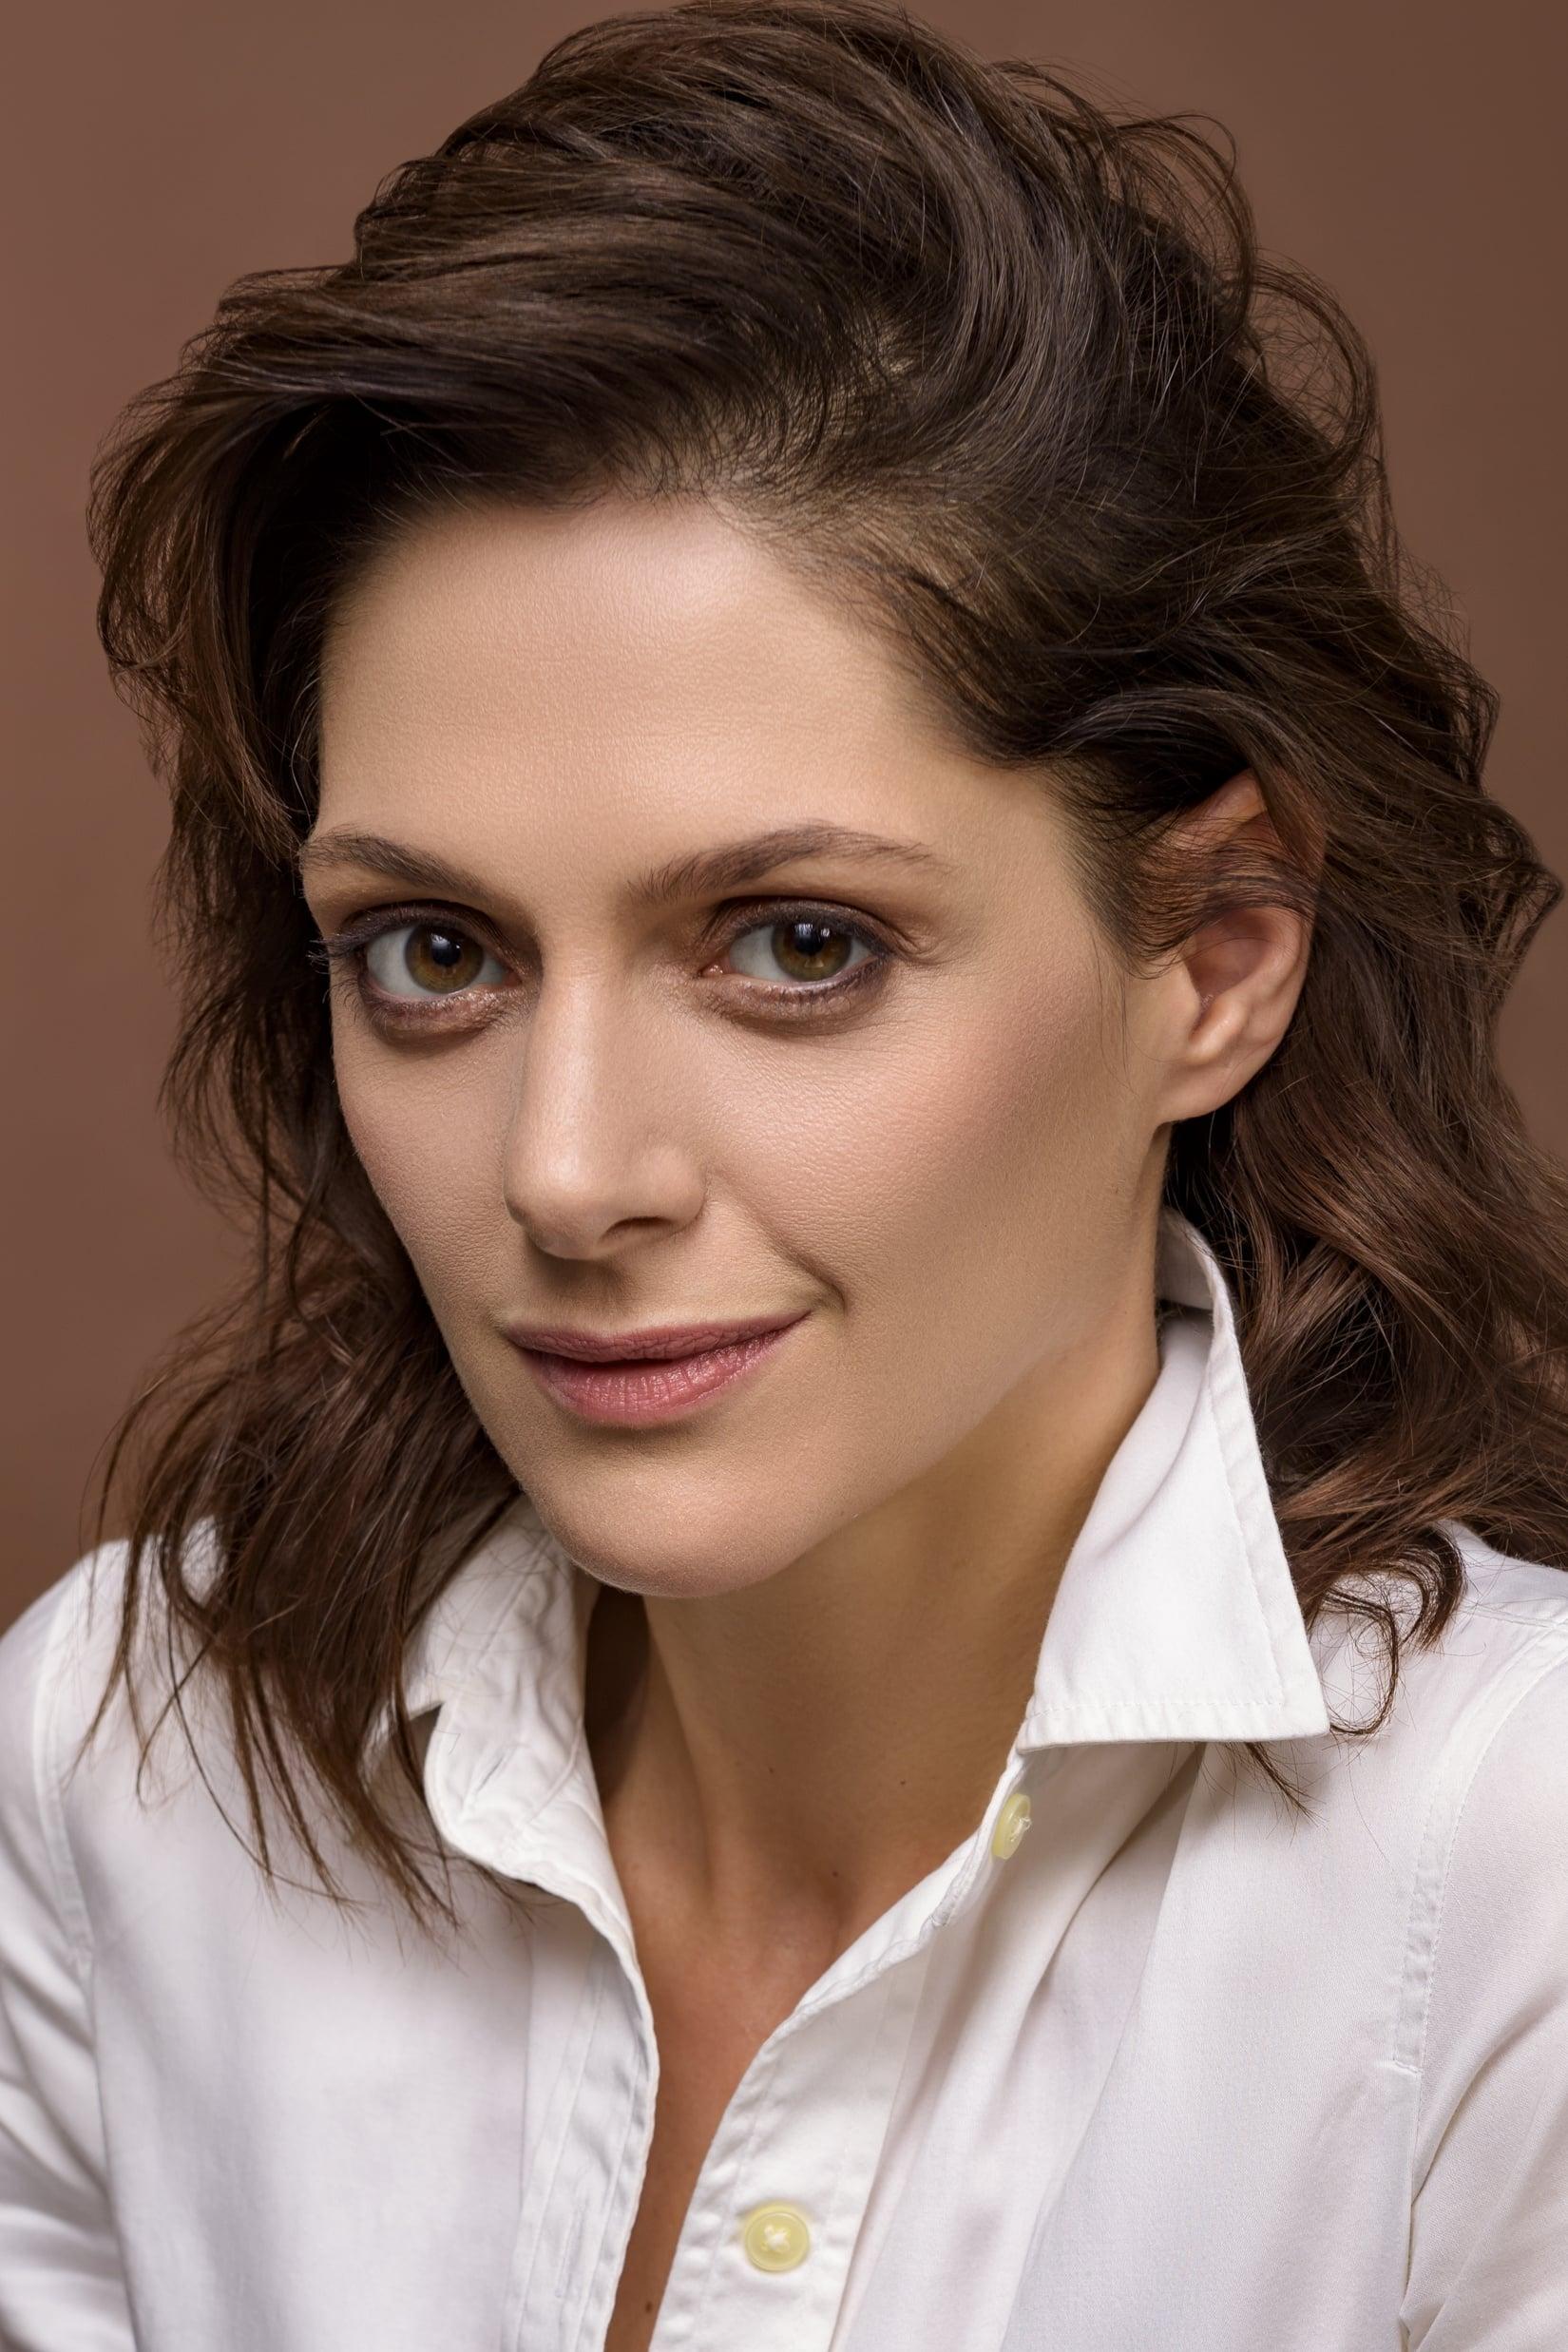 Klára Issová - Profile Images — The Movie Database (TMDb)